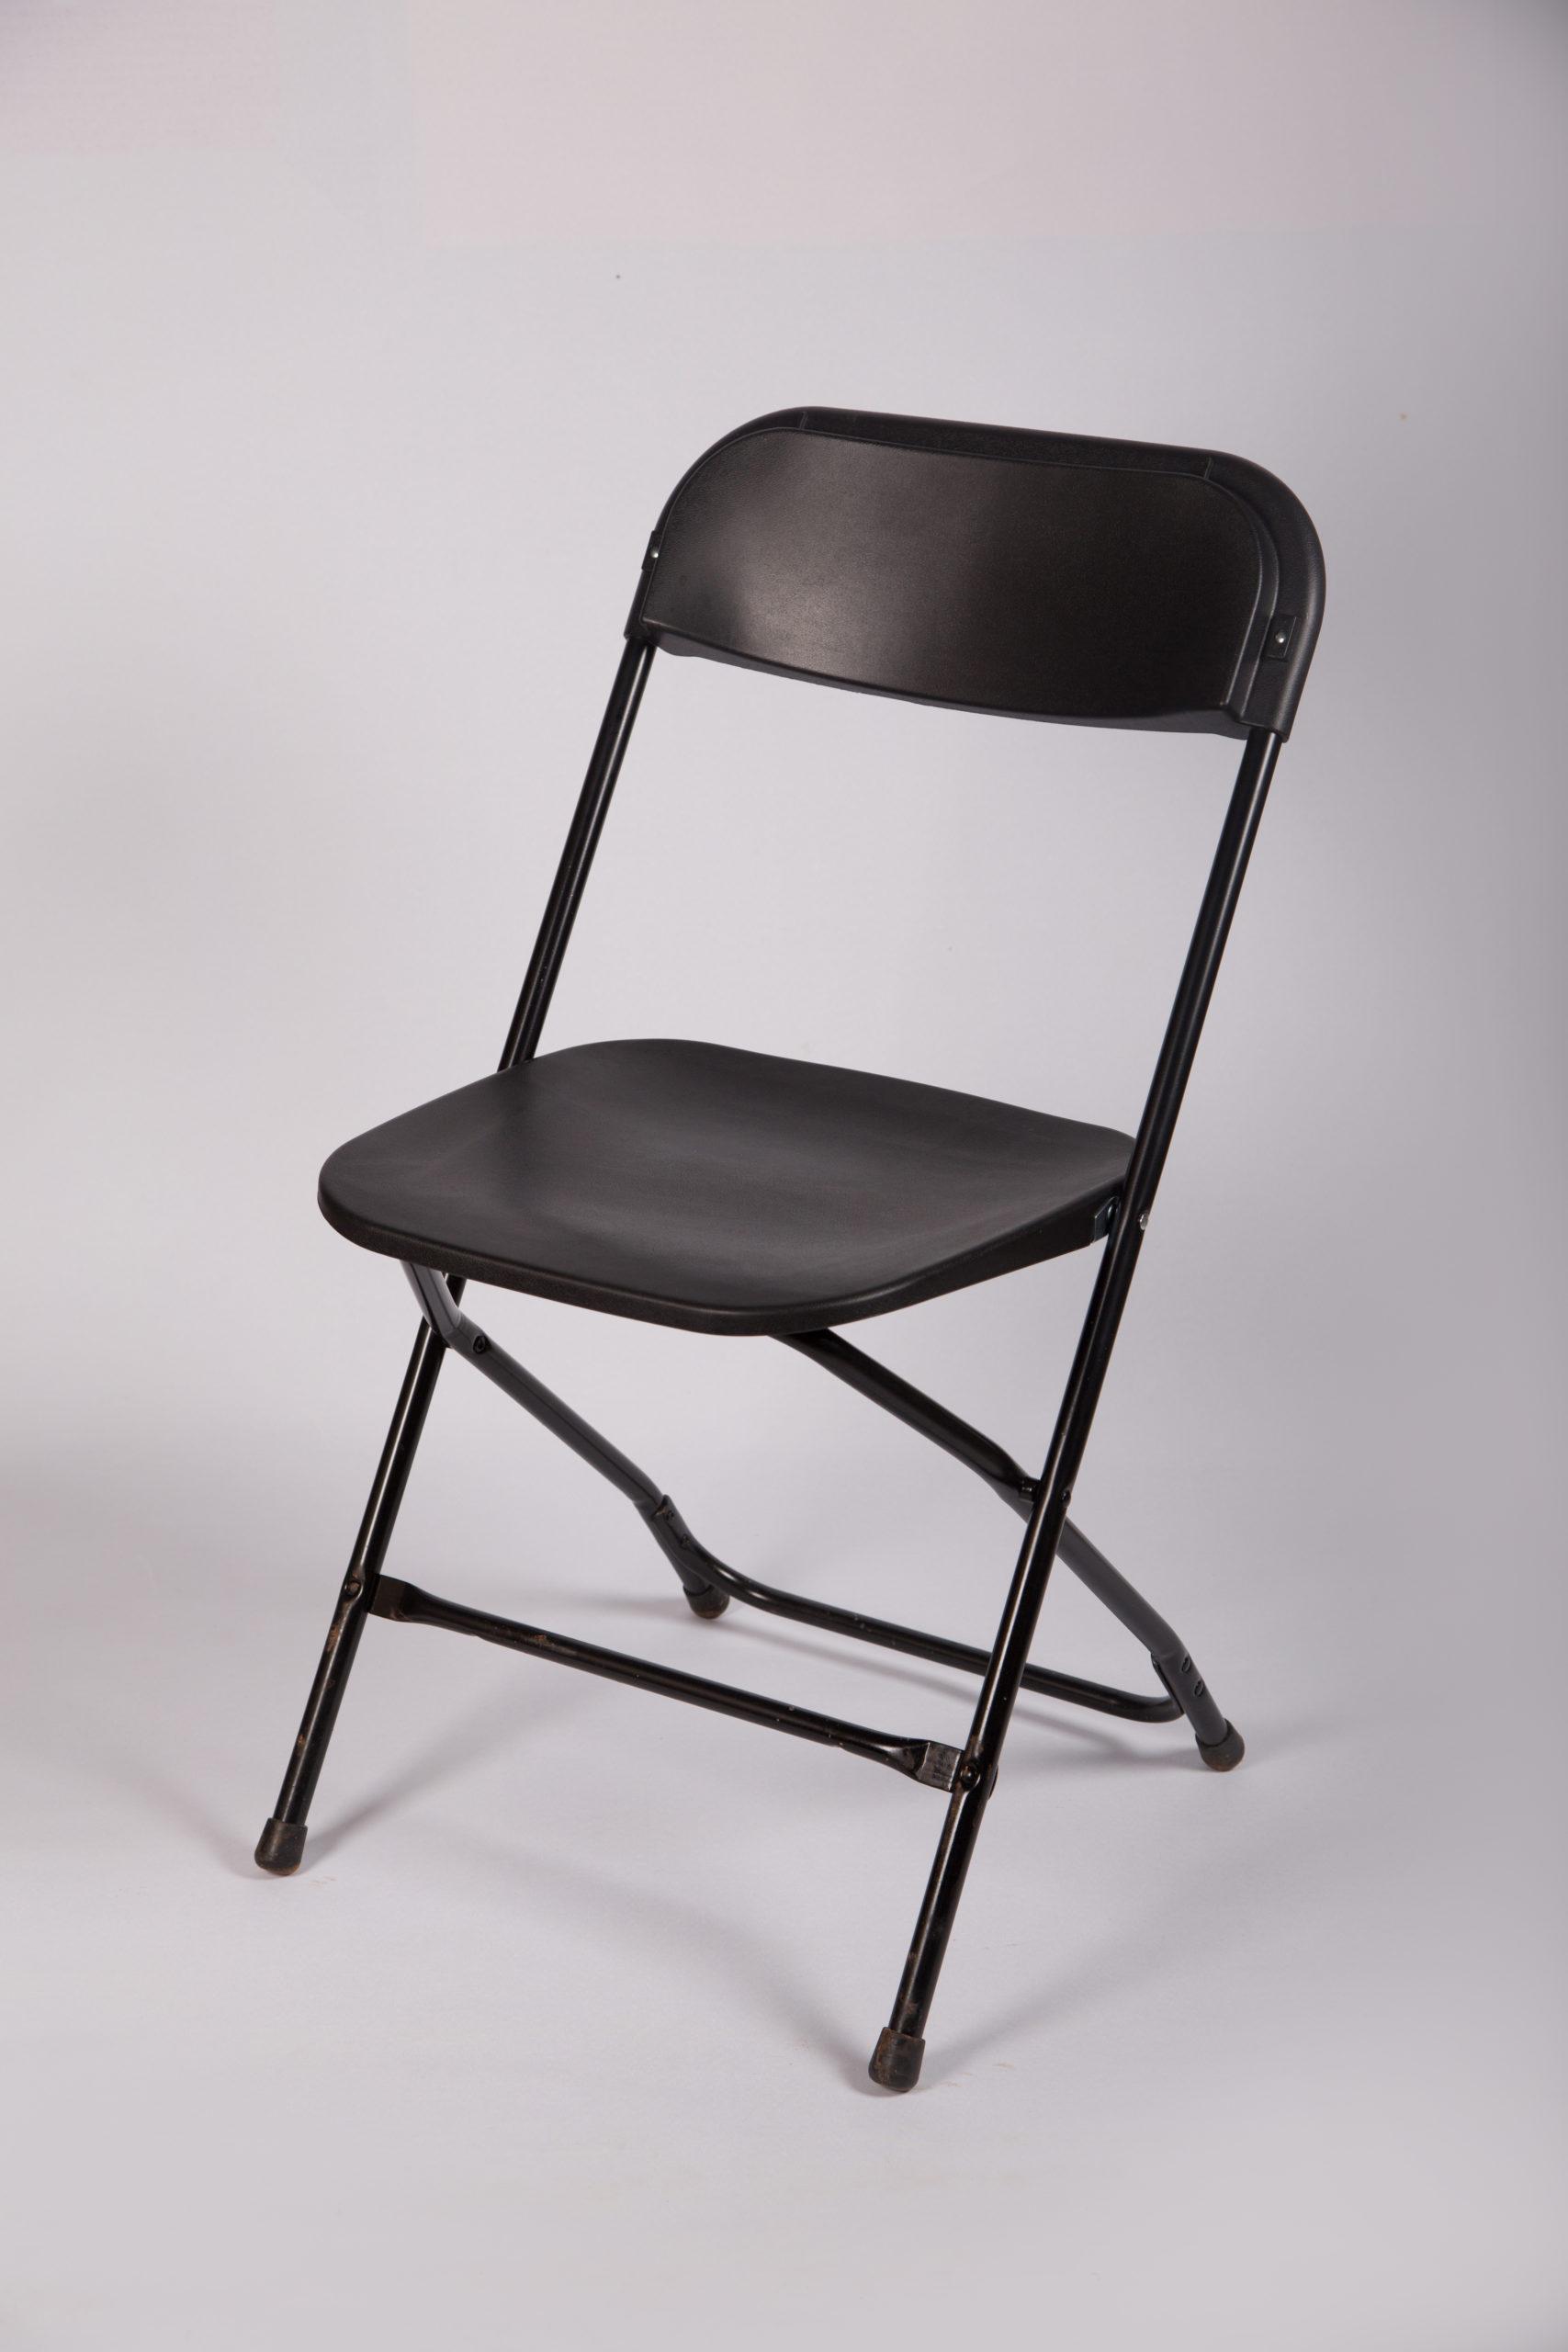 Klappstuhl Kunststoffstuhl Stuhl schwarz